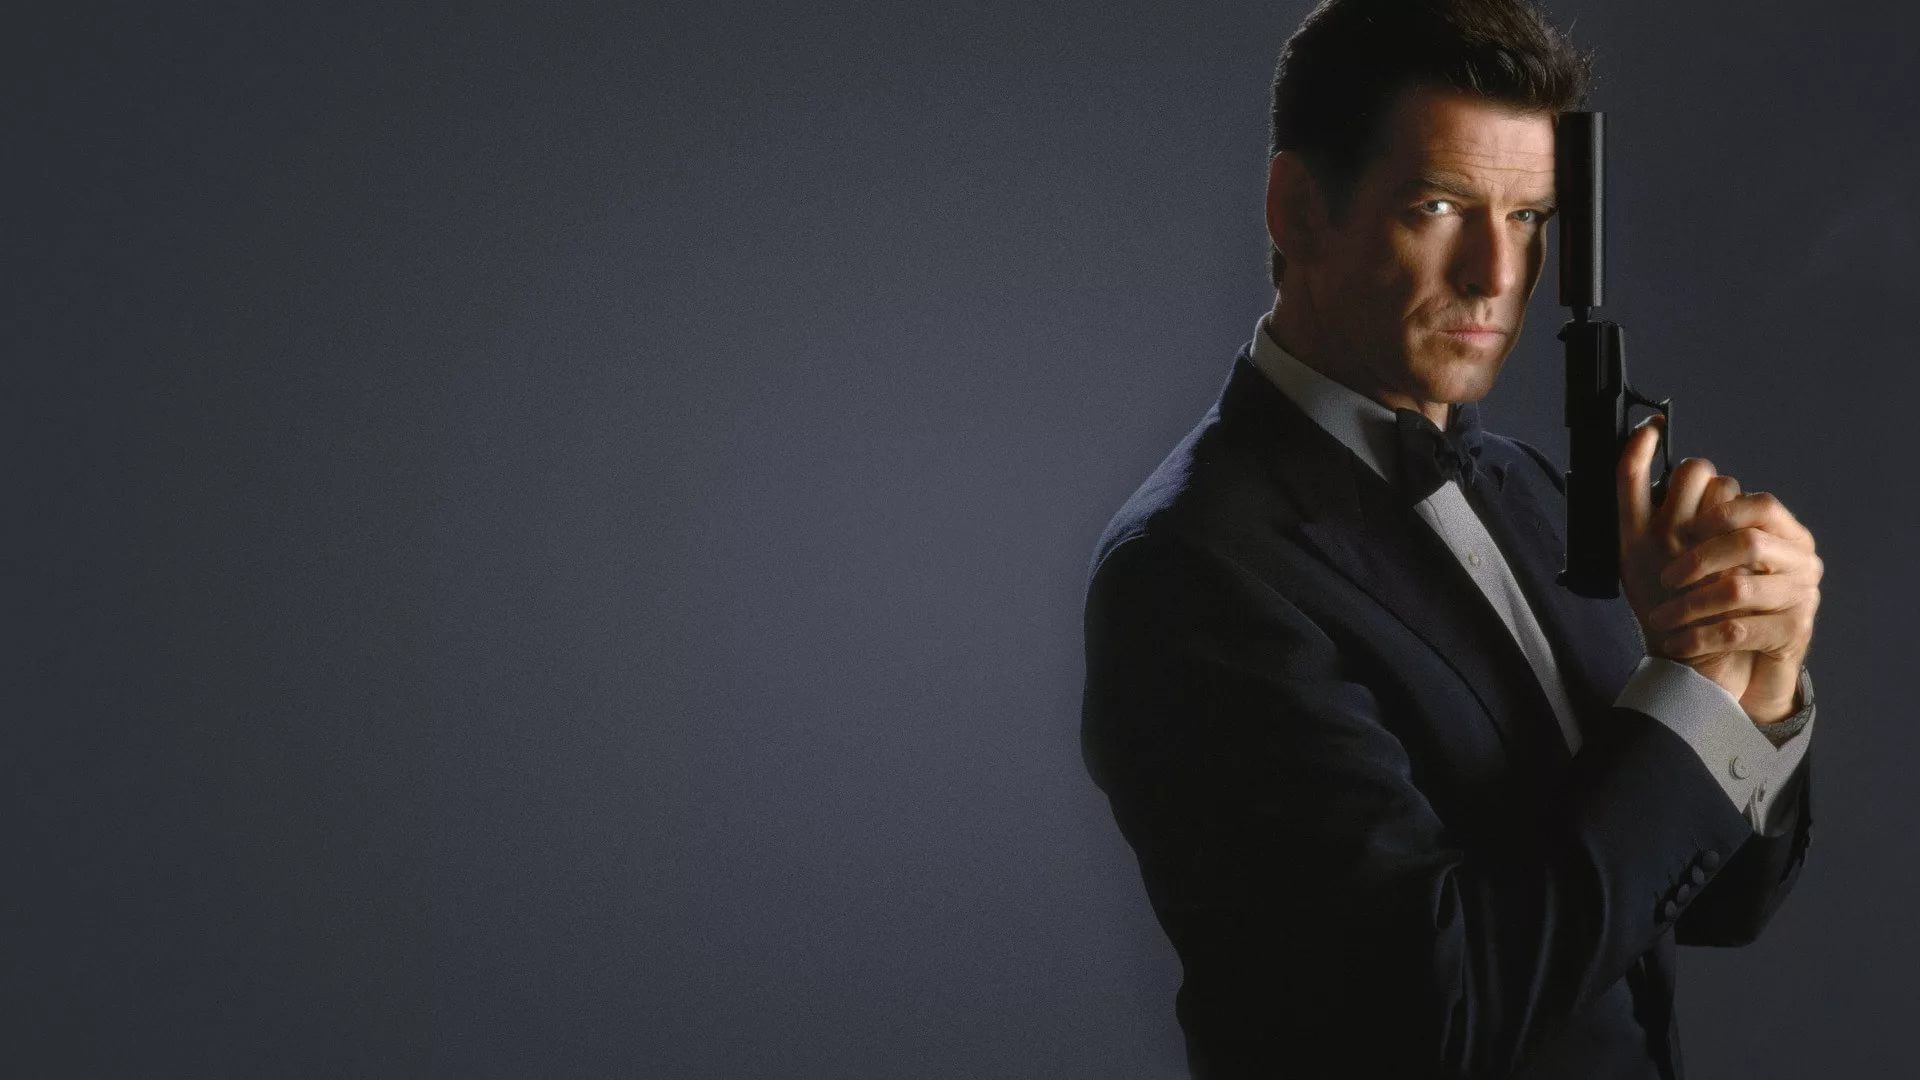 James Bond HD Download